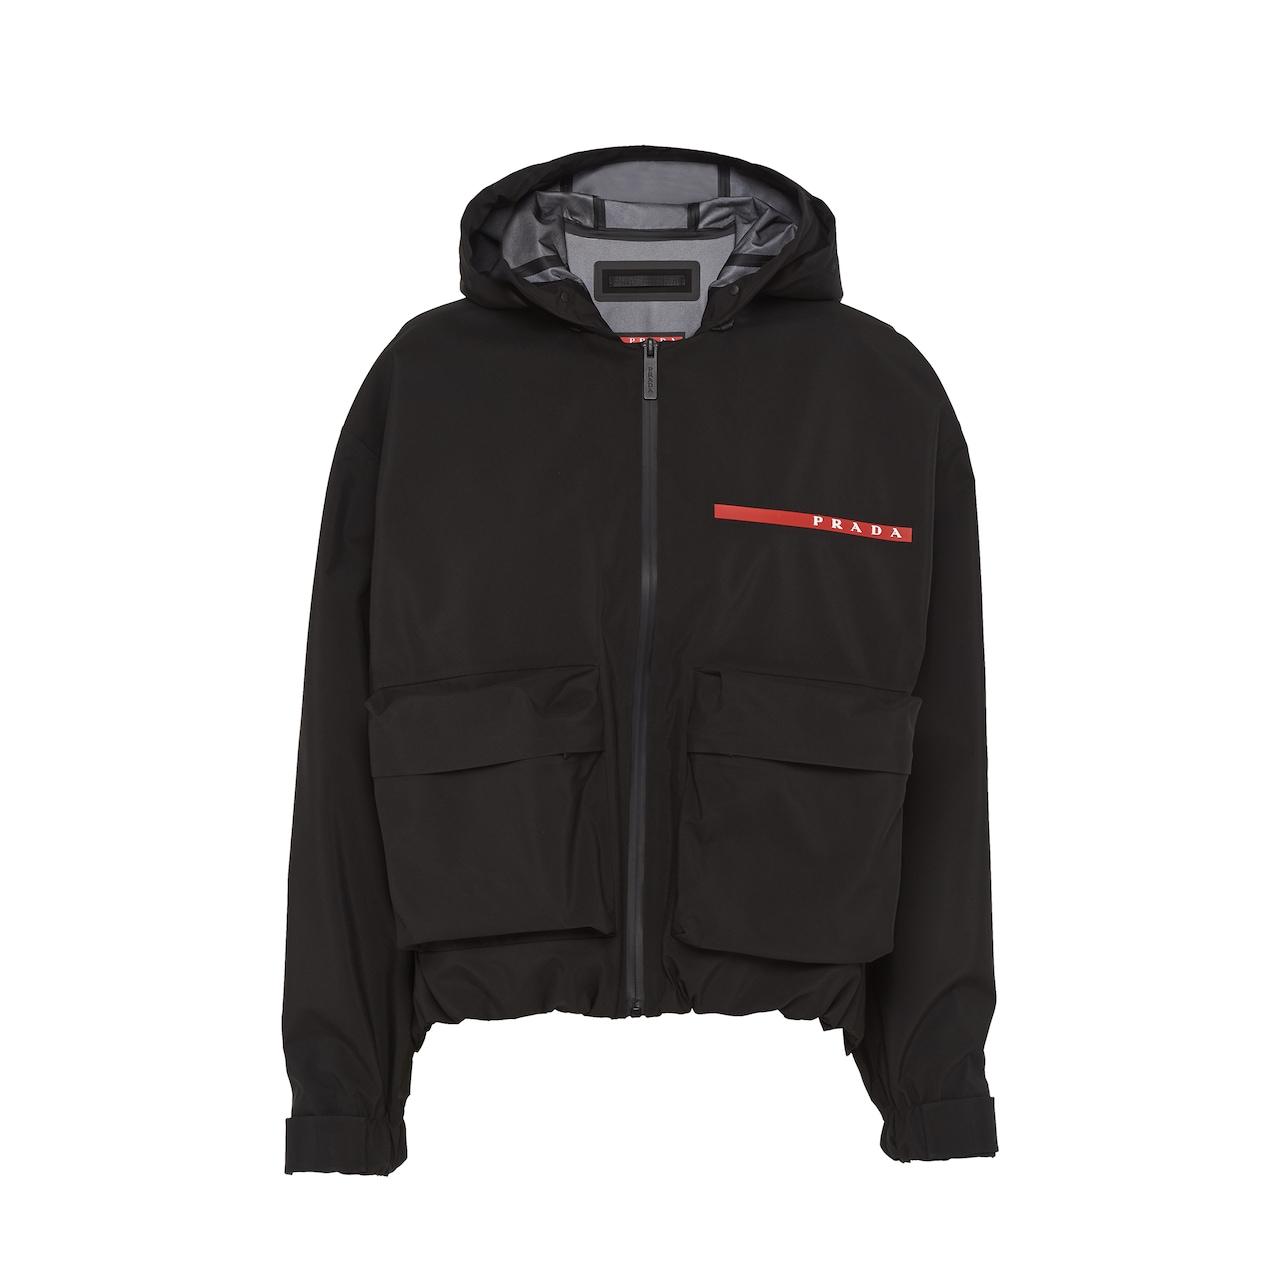 Prada LR-MX026 织物外套 1